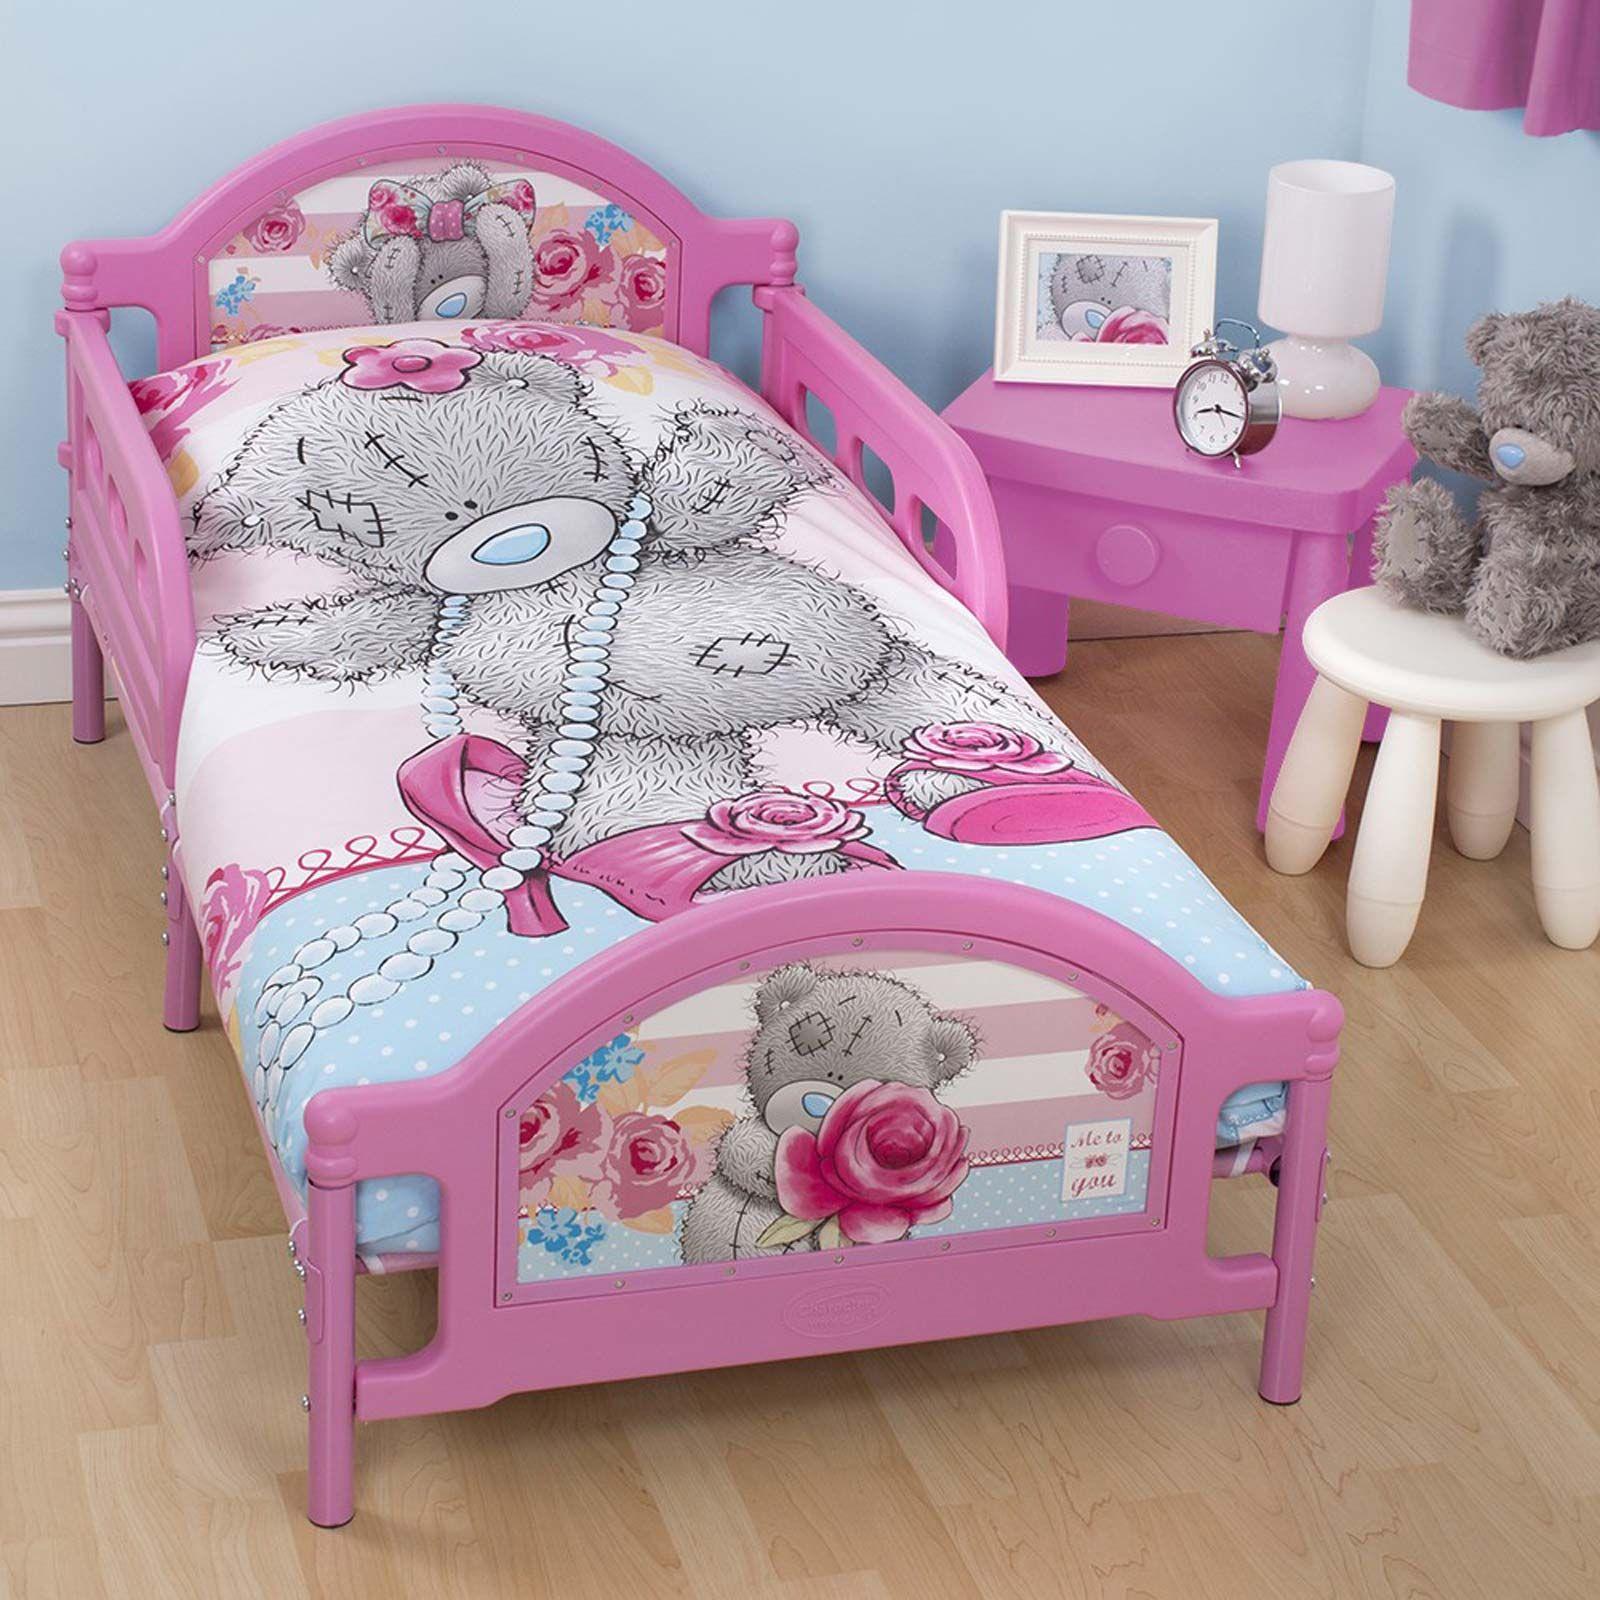 Junior Cot Bed Duvet Covers